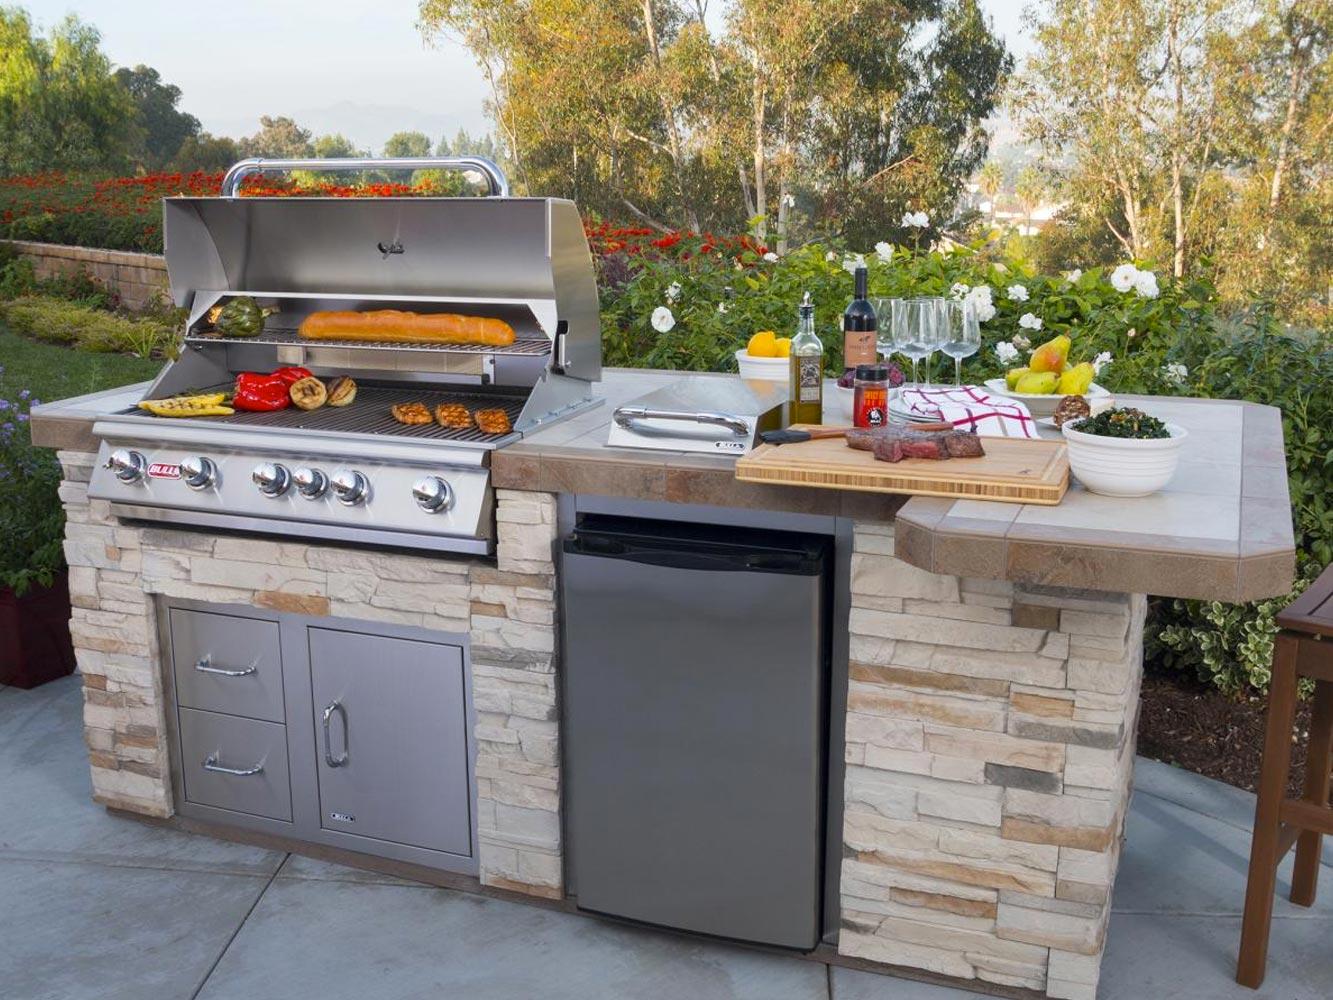 outdoor kitchen bbq wood tile floor bc home leisure